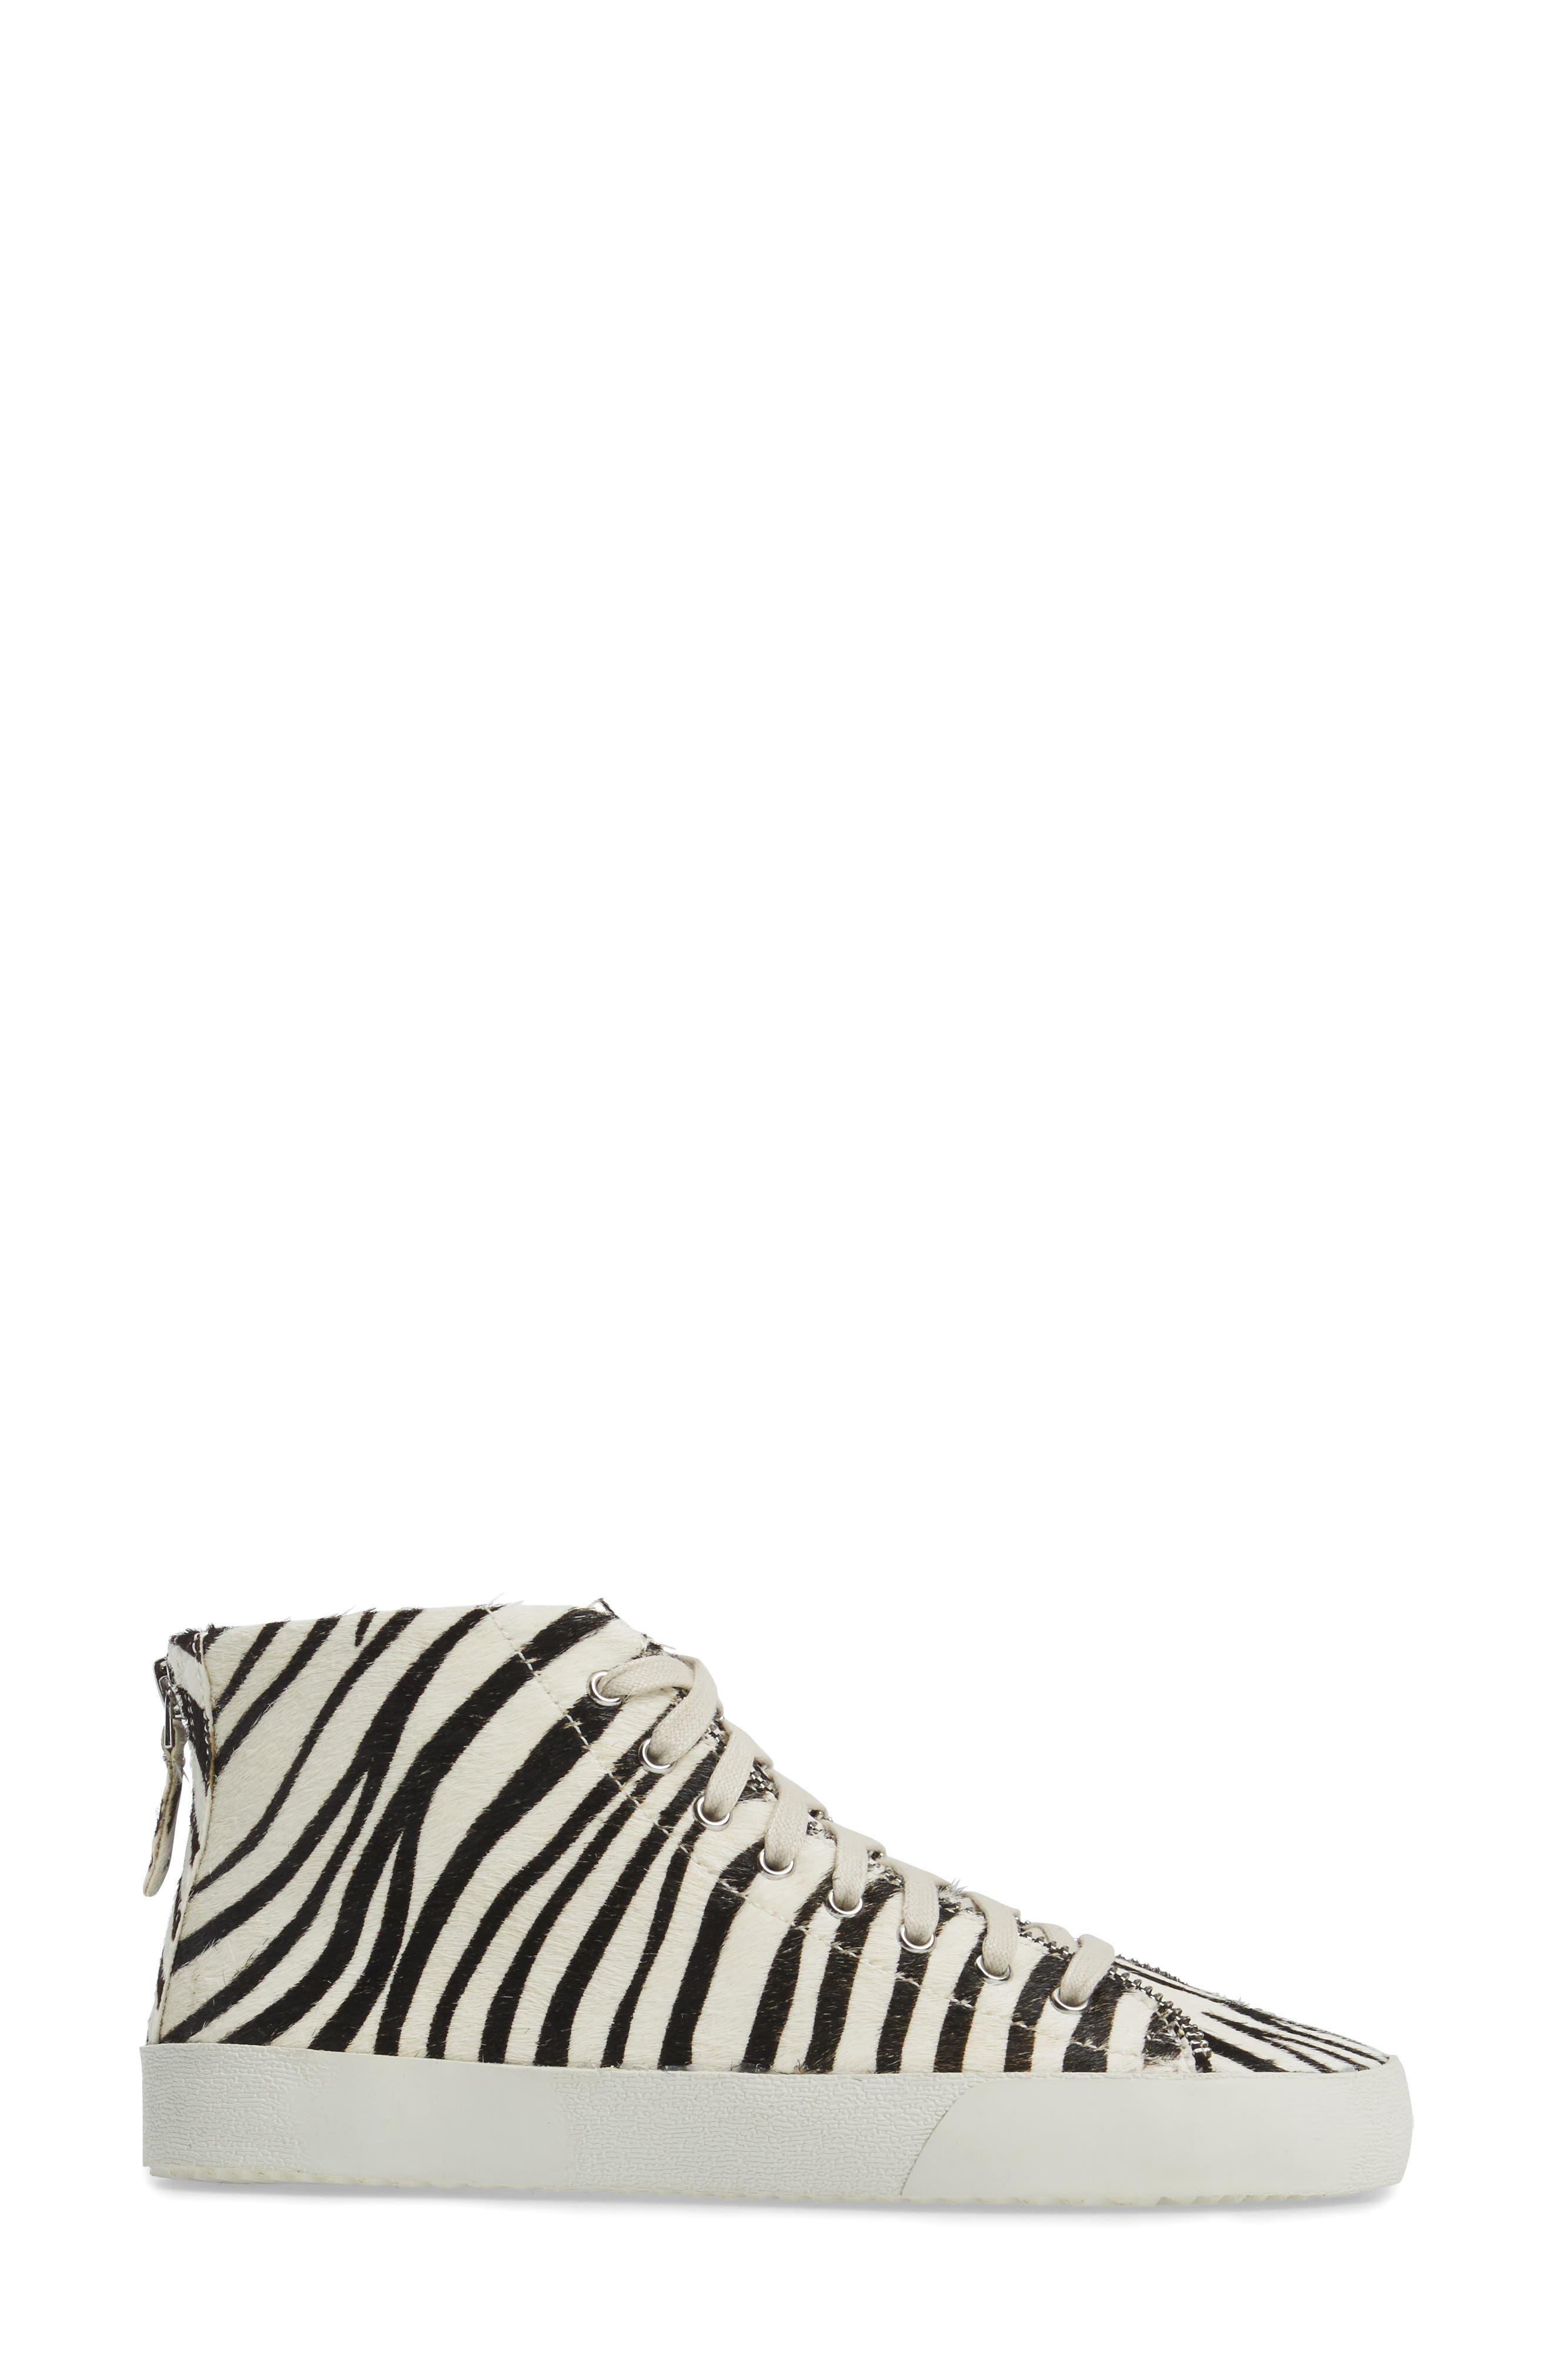 Zaina Too Genuine Calf Hair Sneaker,                             Alternate thumbnail 3, color,                             100